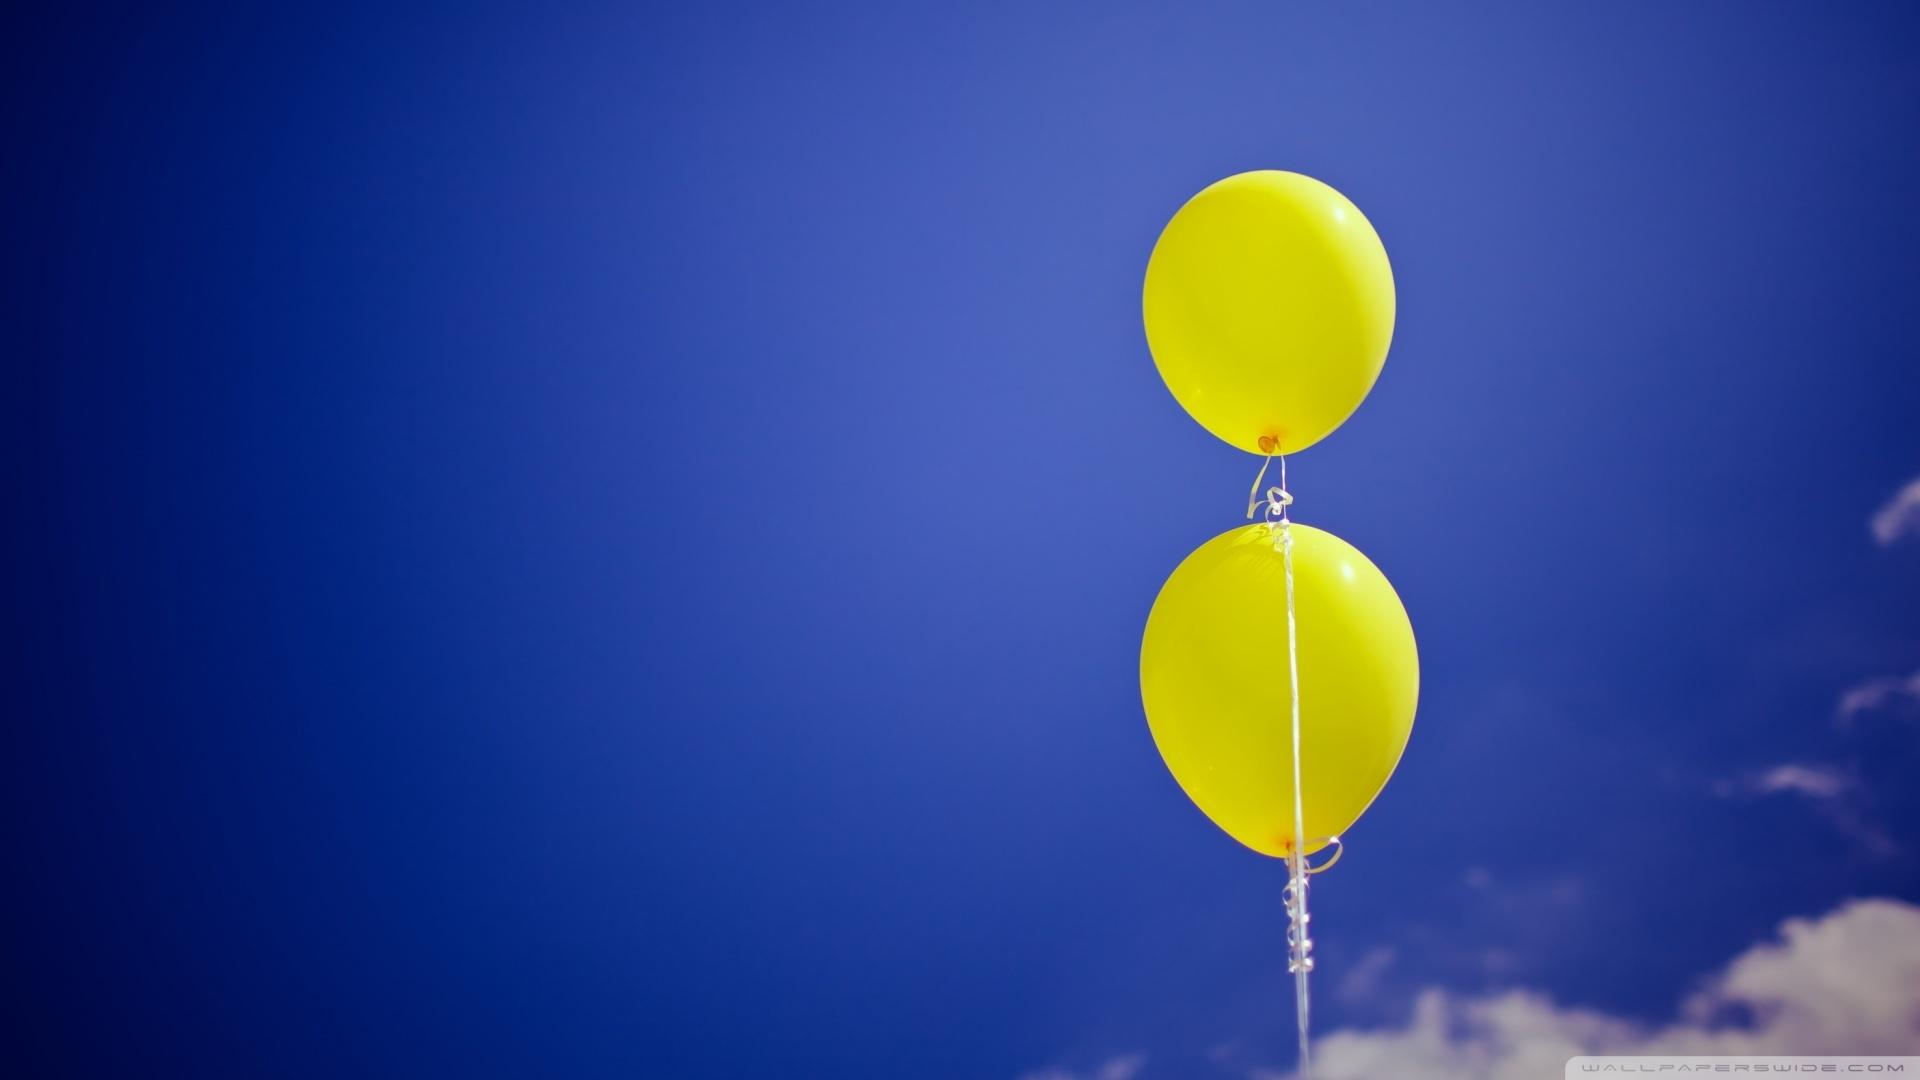 yellow-balloons_00434175